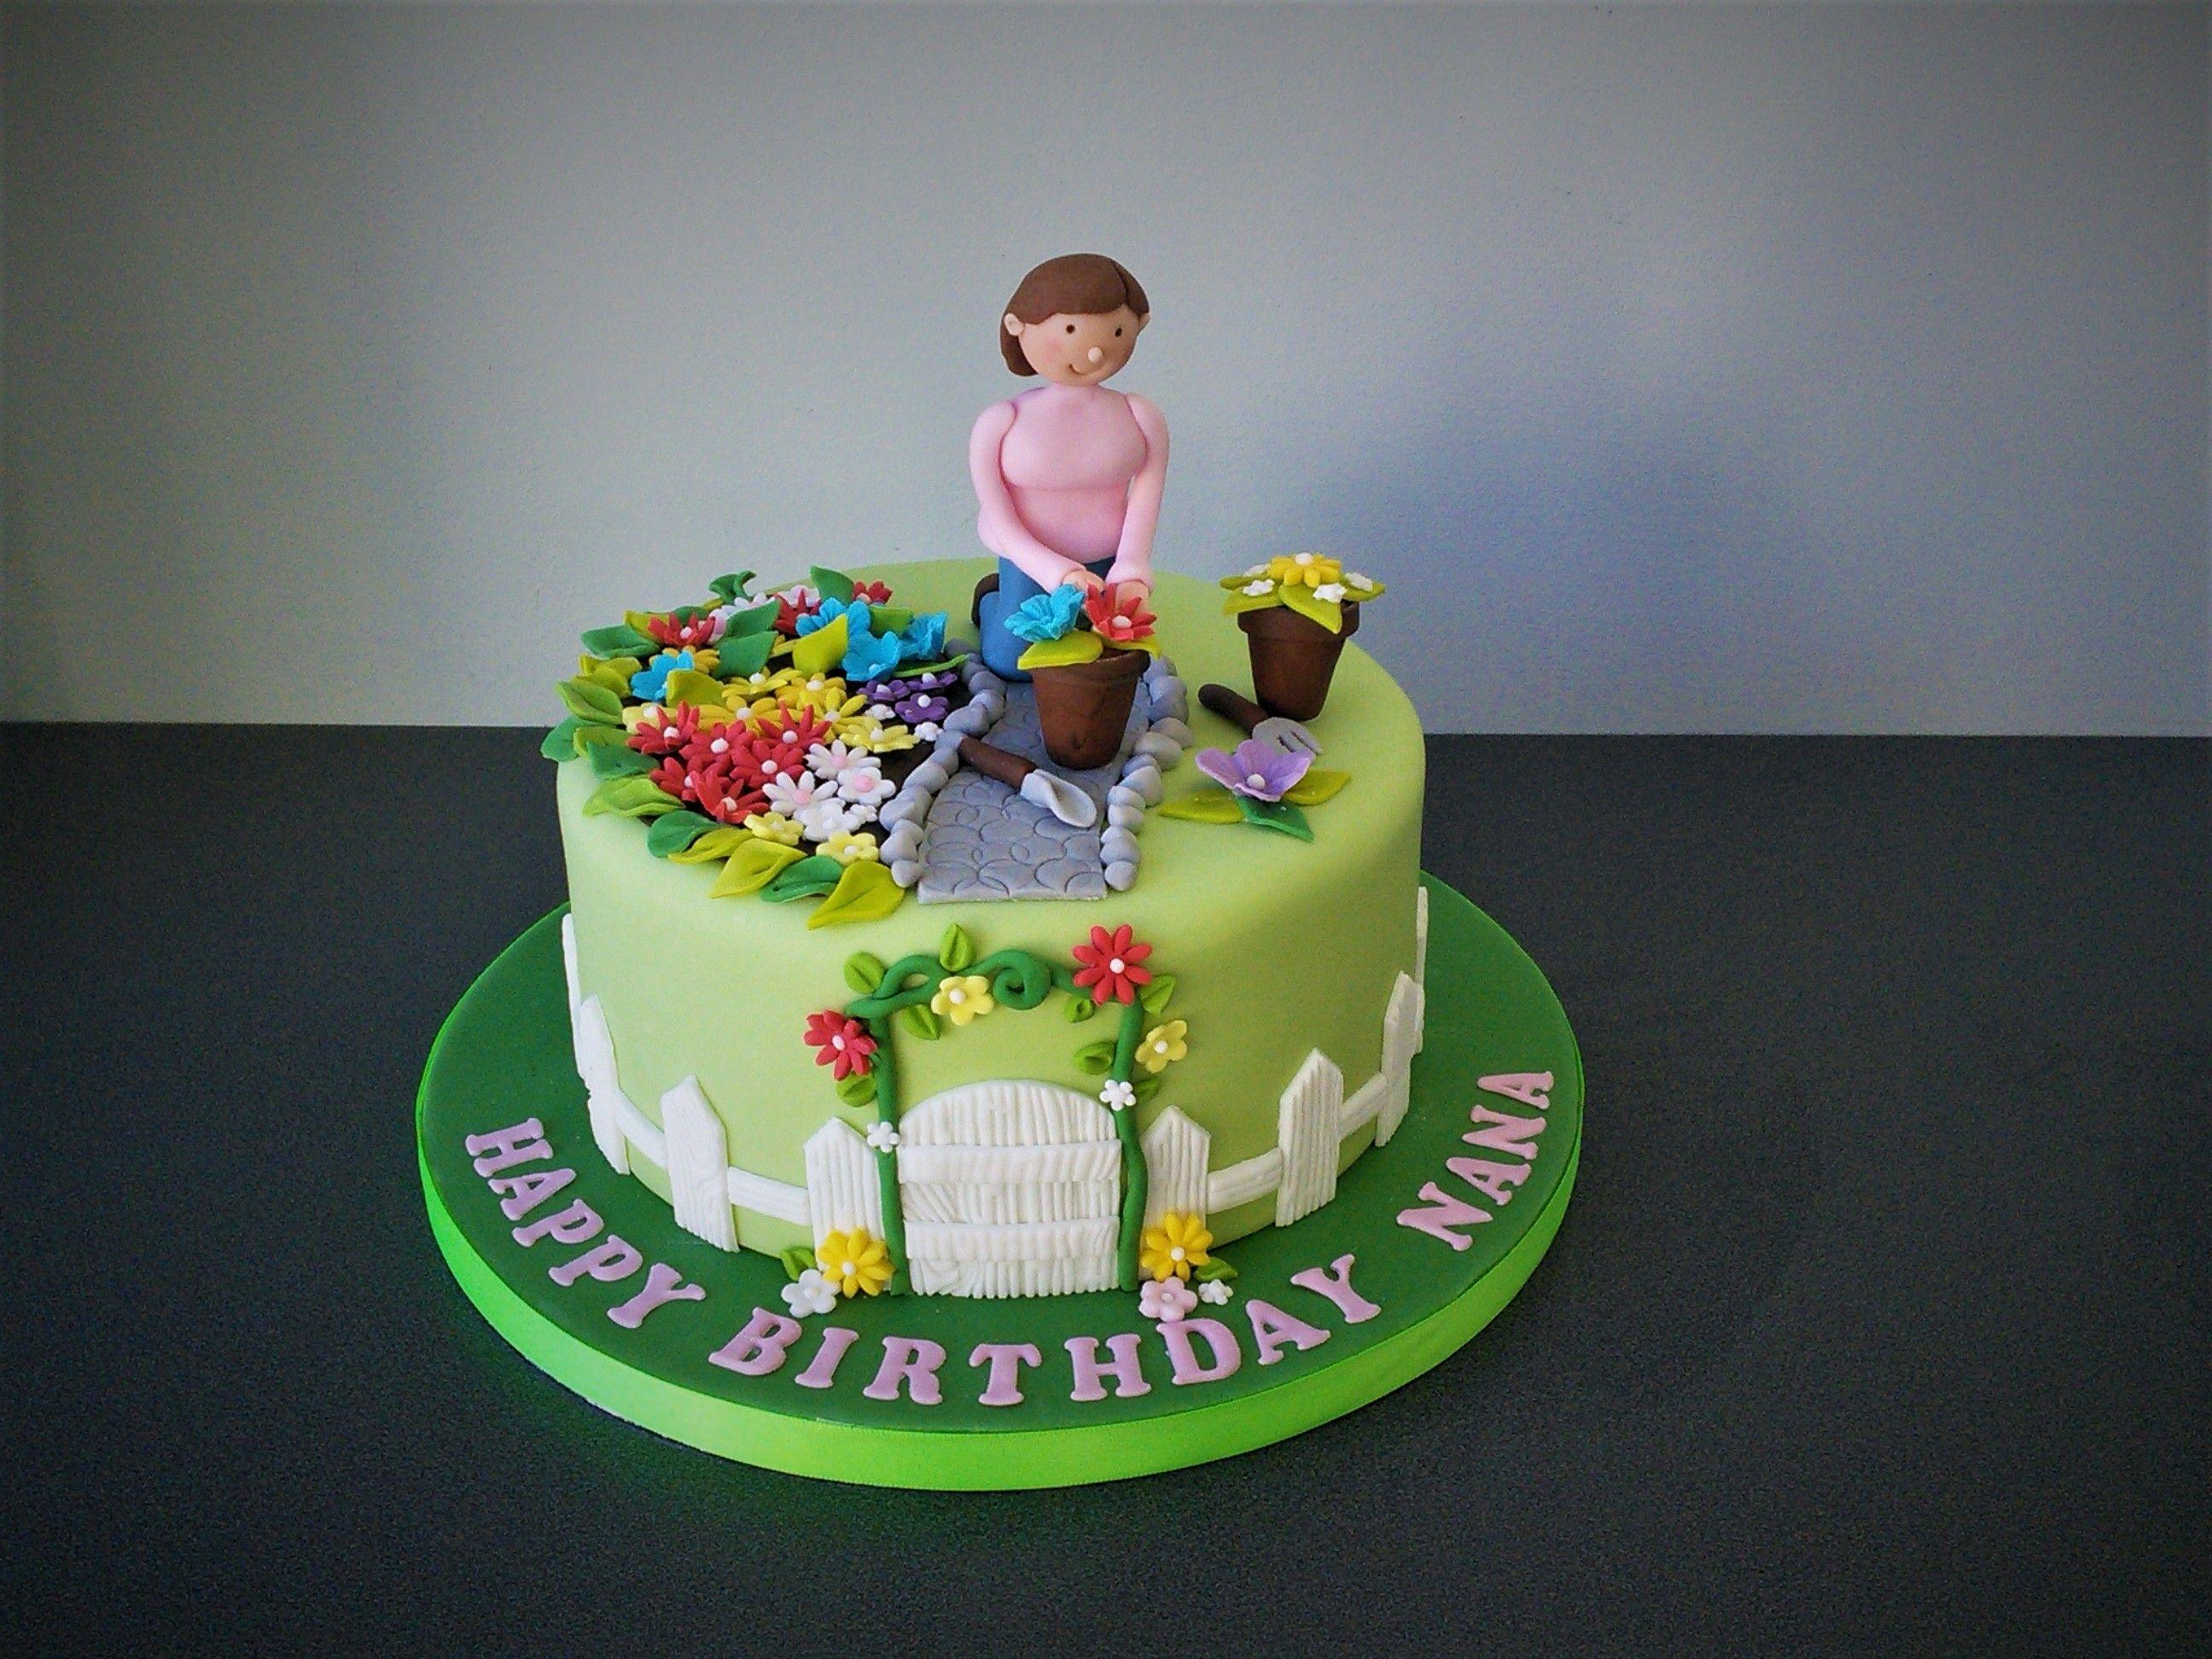 Peachy Lady Gardening Cake Cake Garden Cakes Birthday Cakes For Women Funny Birthday Cards Online Overcheapnameinfo